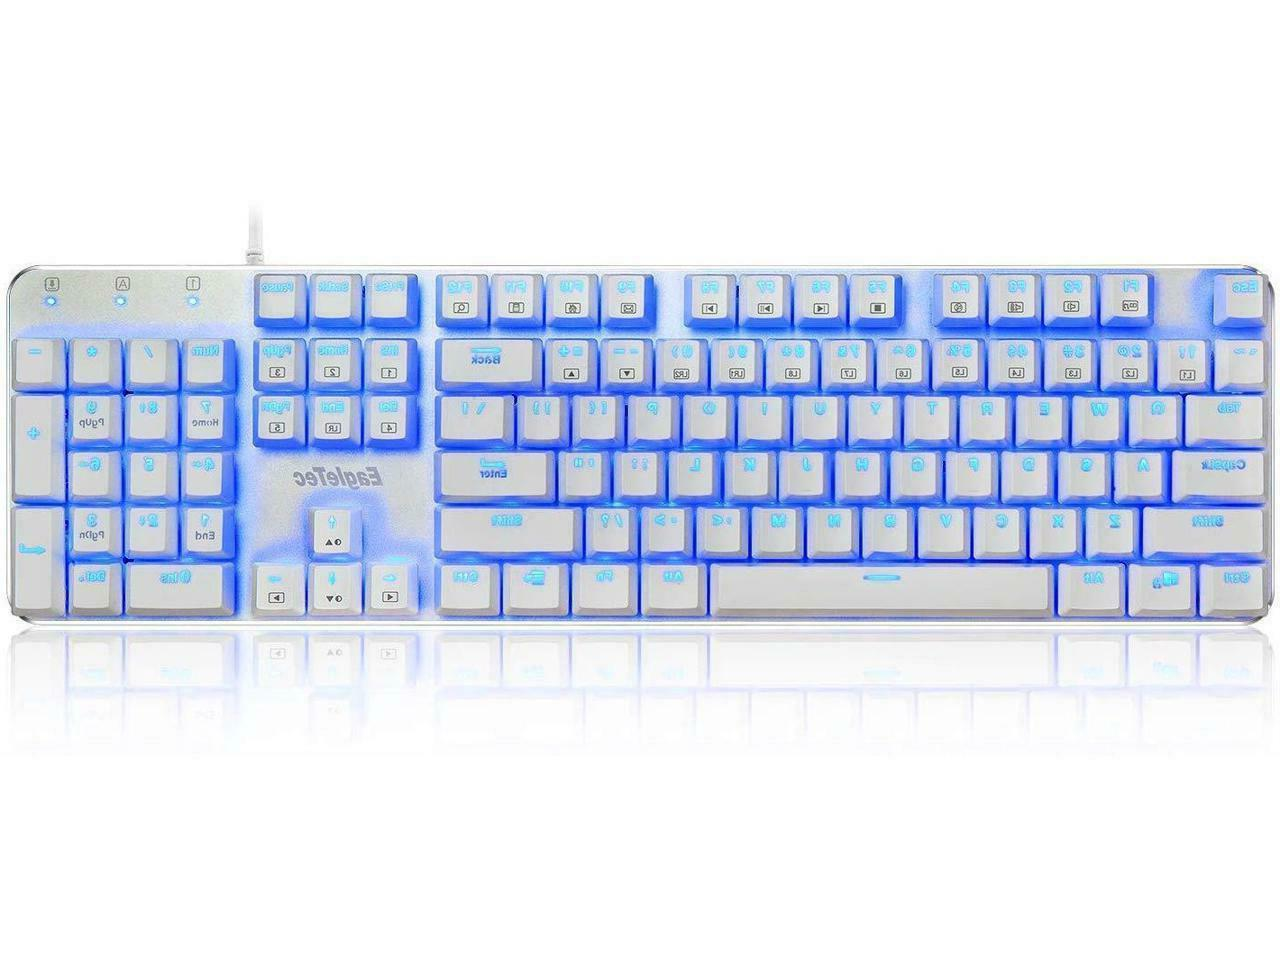 EagleTec KG051 Mechanical Gaming Keyboard Profile Key